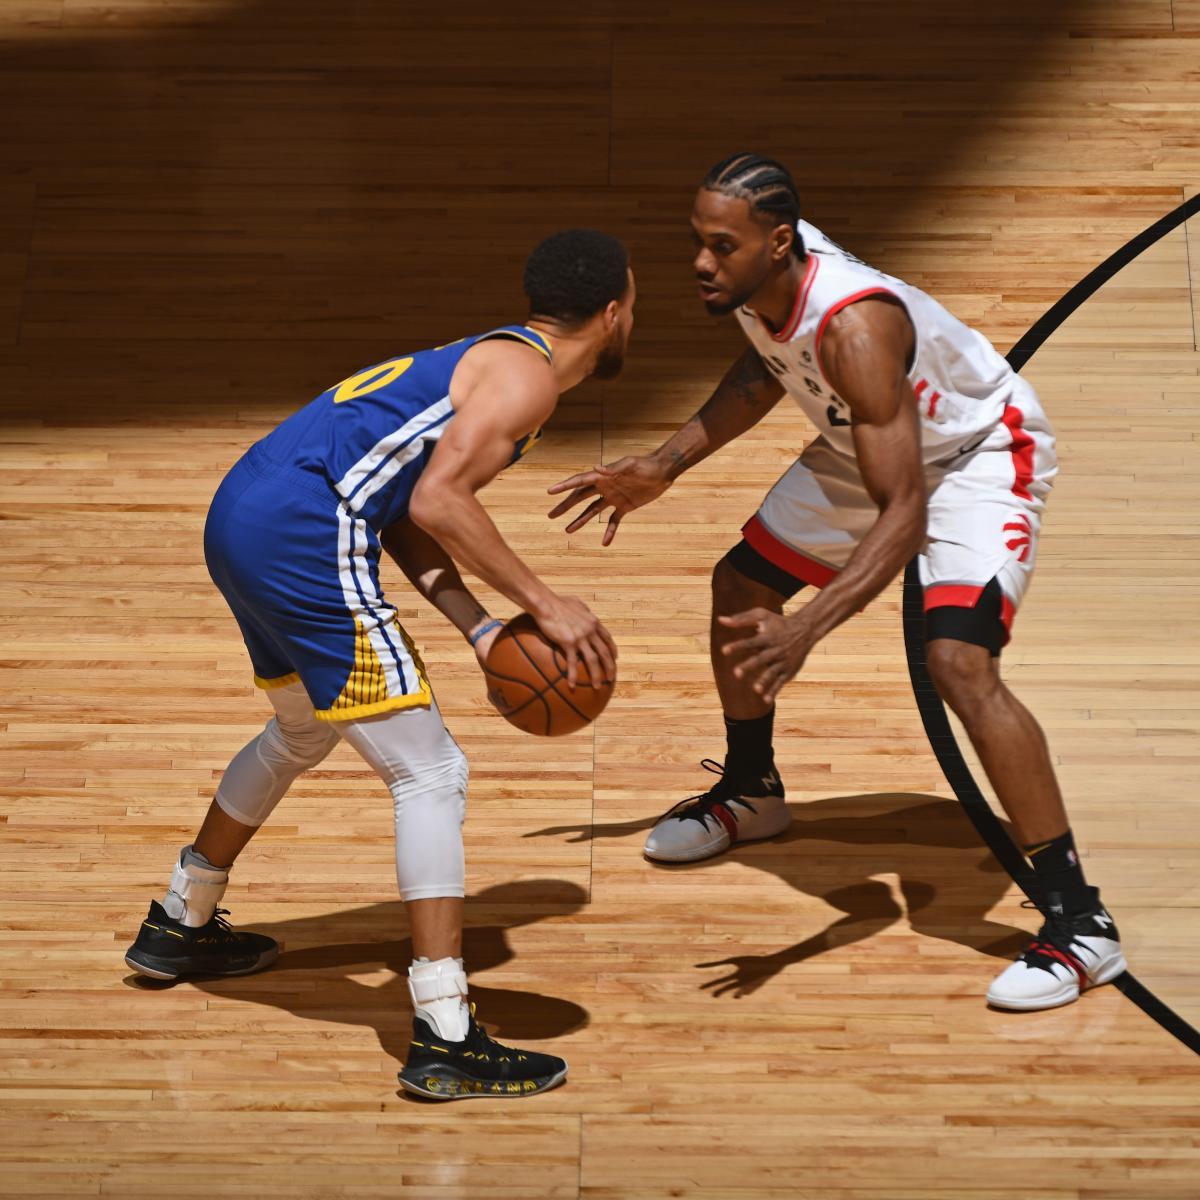 https://t.co/fgVRKDLa0J : Raptors vs. Warriors Game 6 TV Schedule, Live Stream Guide for 2019 NBA Finals https://t.co/WBv5RLeIvb https://t.co/YoqgtMAIBy